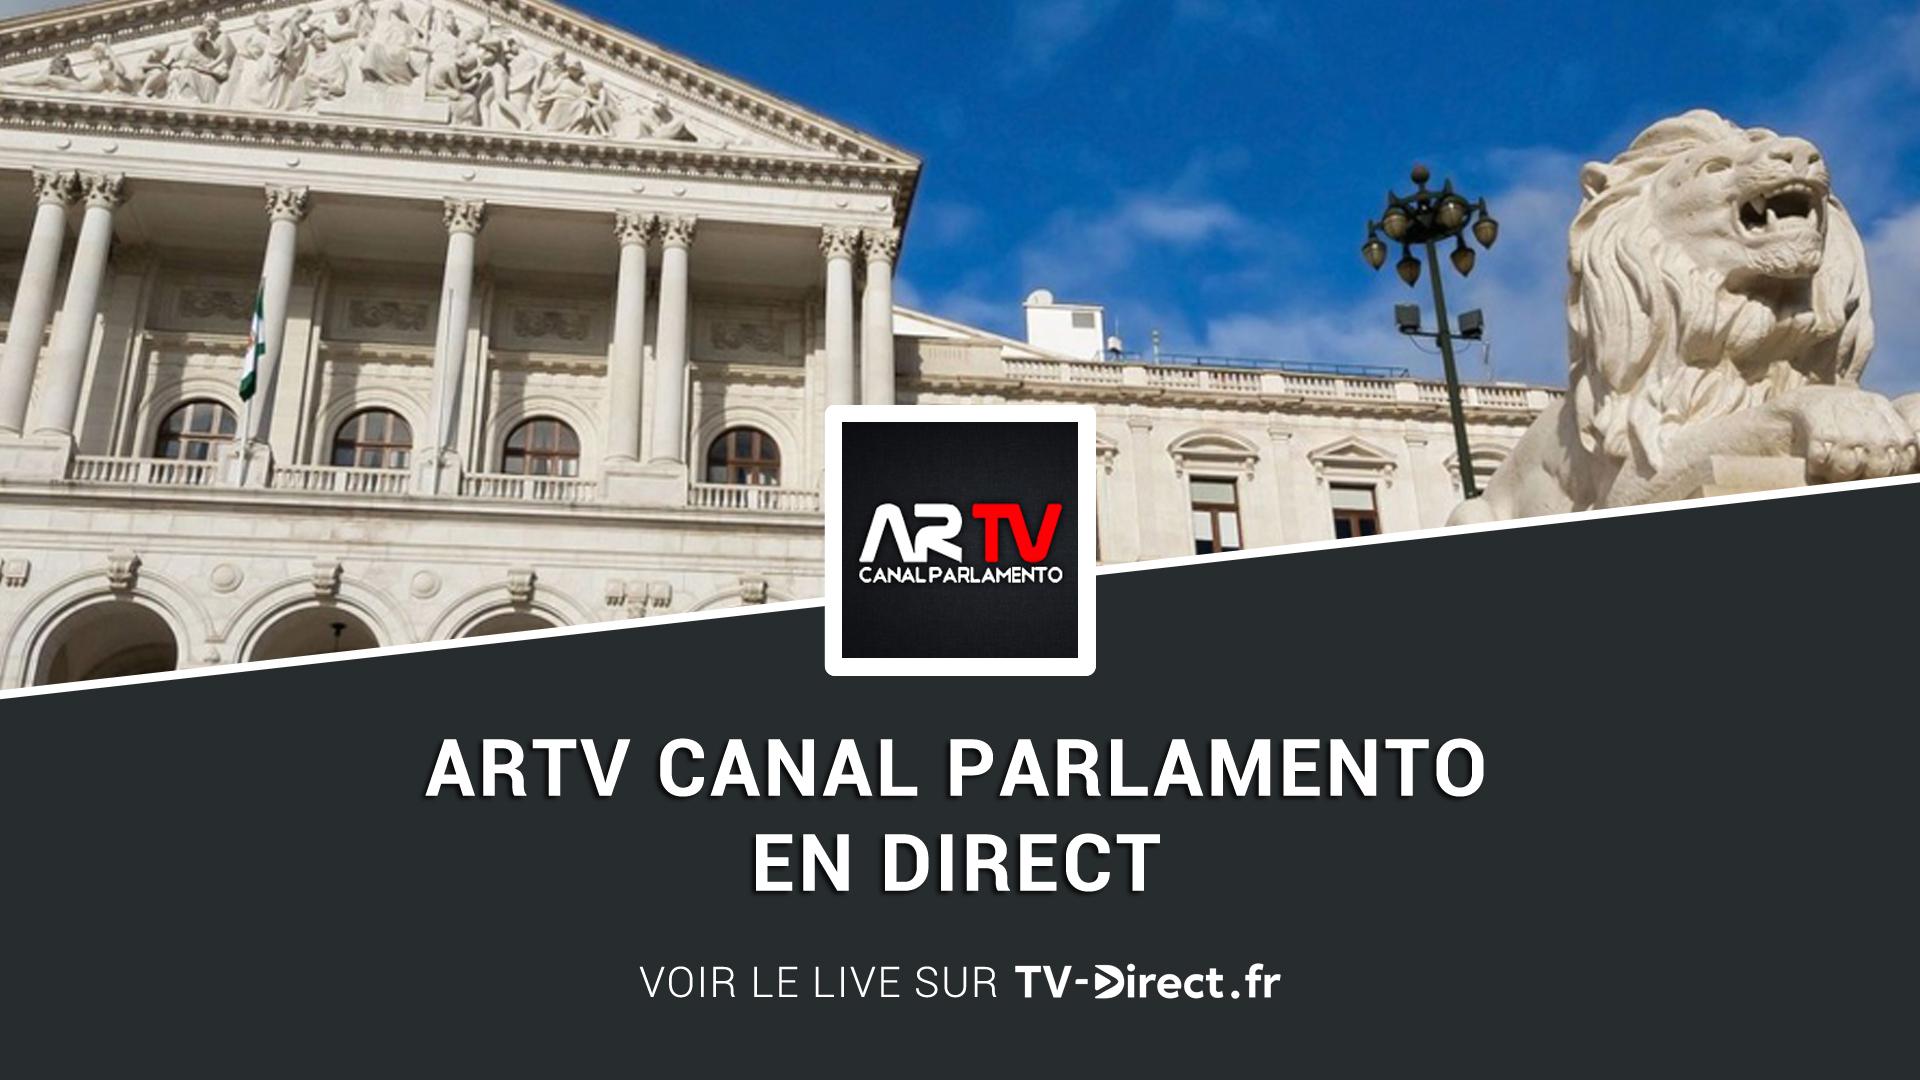 artv canal parlamento direct regarder le live sur internet. Black Bedroom Furniture Sets. Home Design Ideas